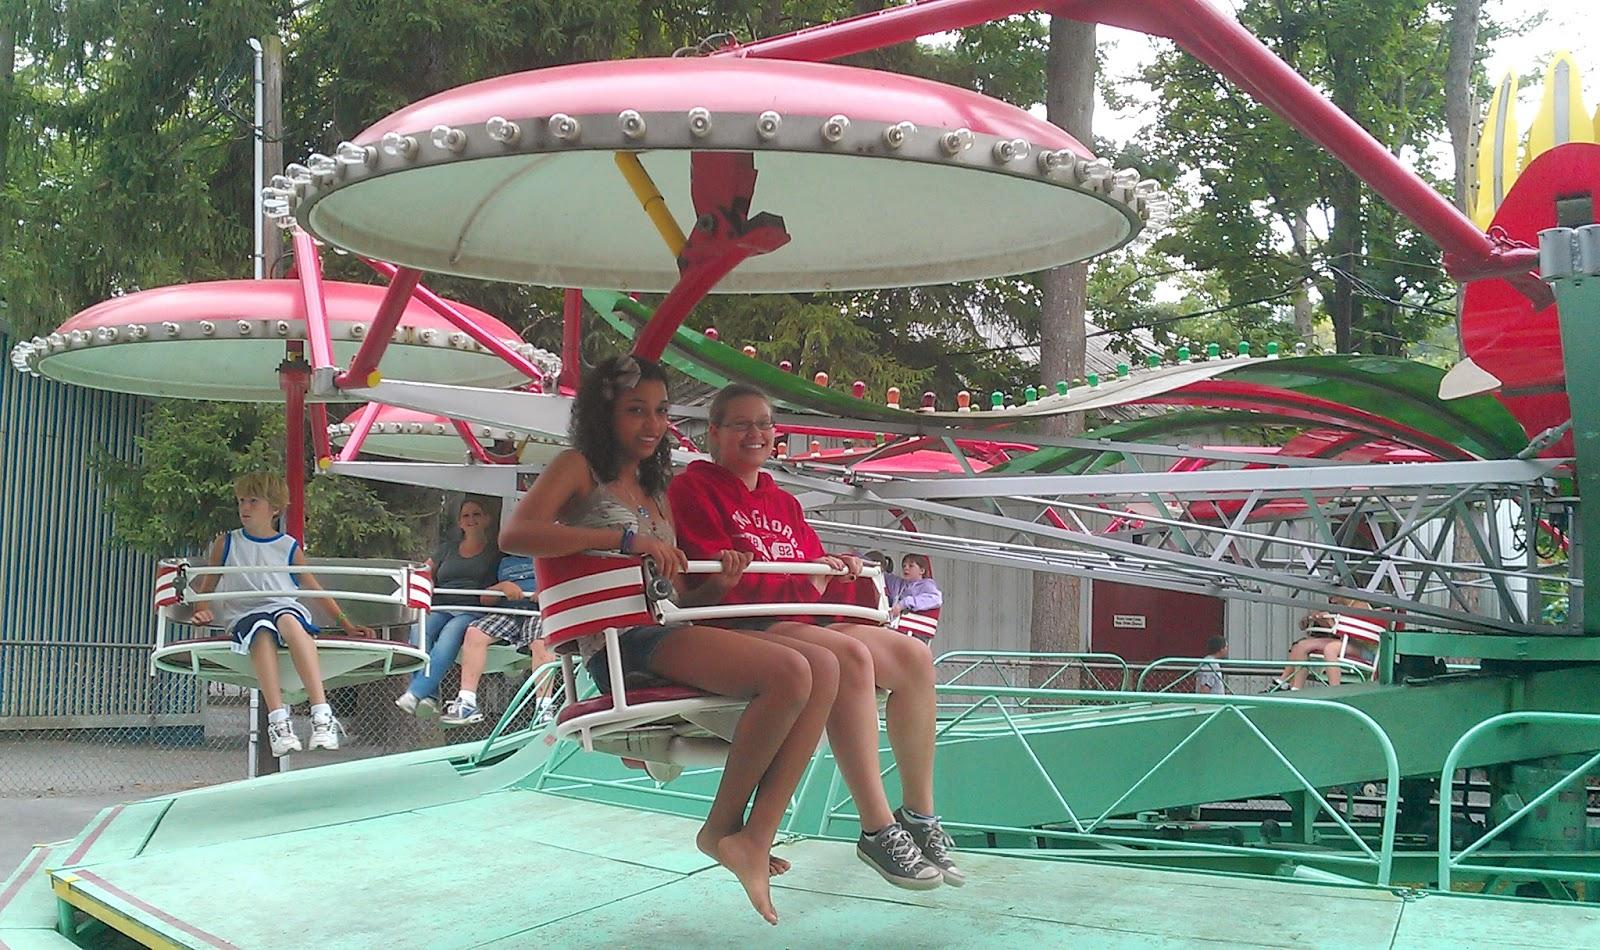 Enjoying the Parachute Ride at Knoebels